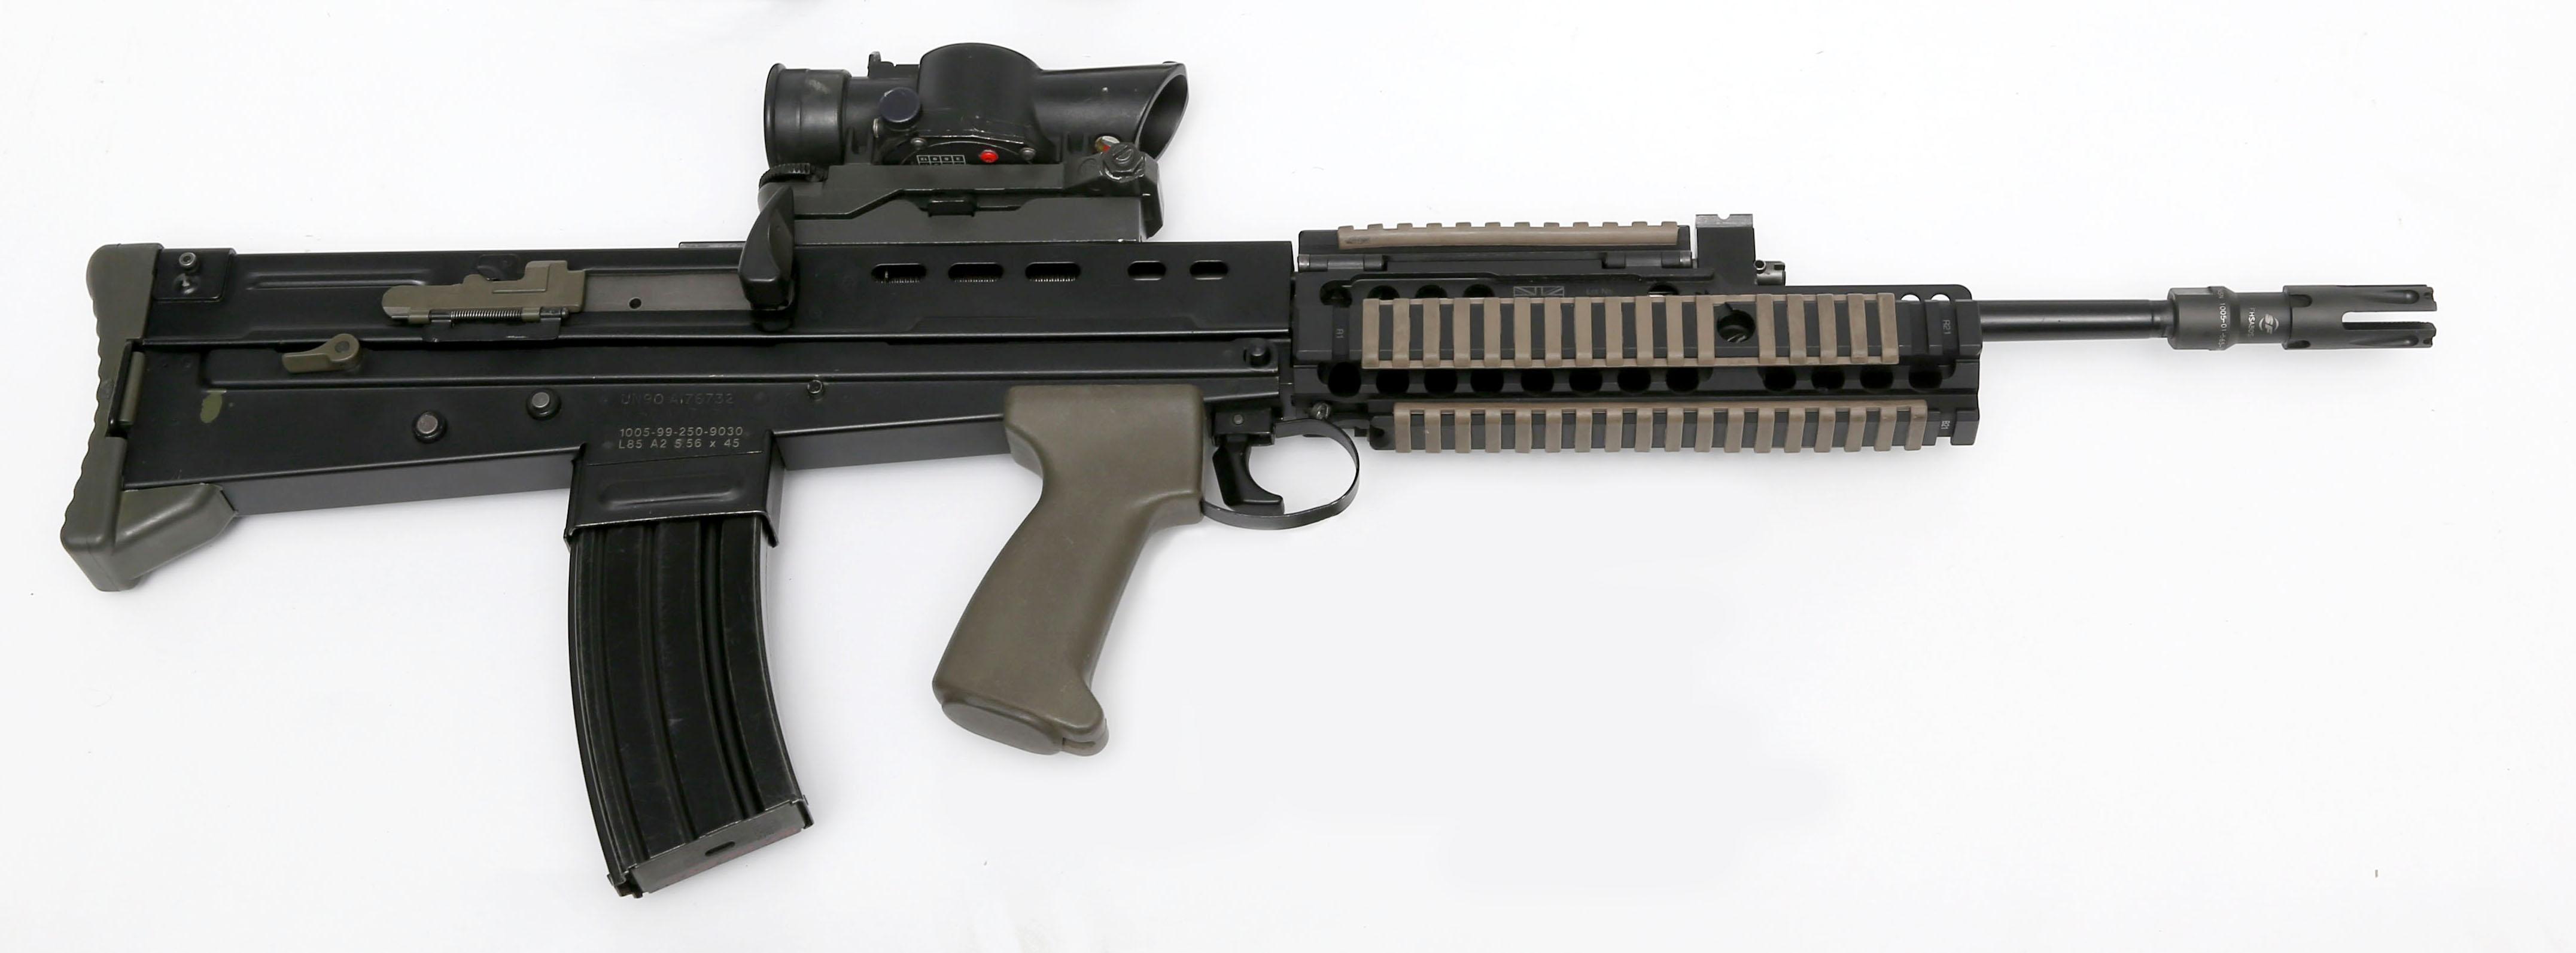 SA80-A2_Individual_Weapon_(IW)_MOD_45160